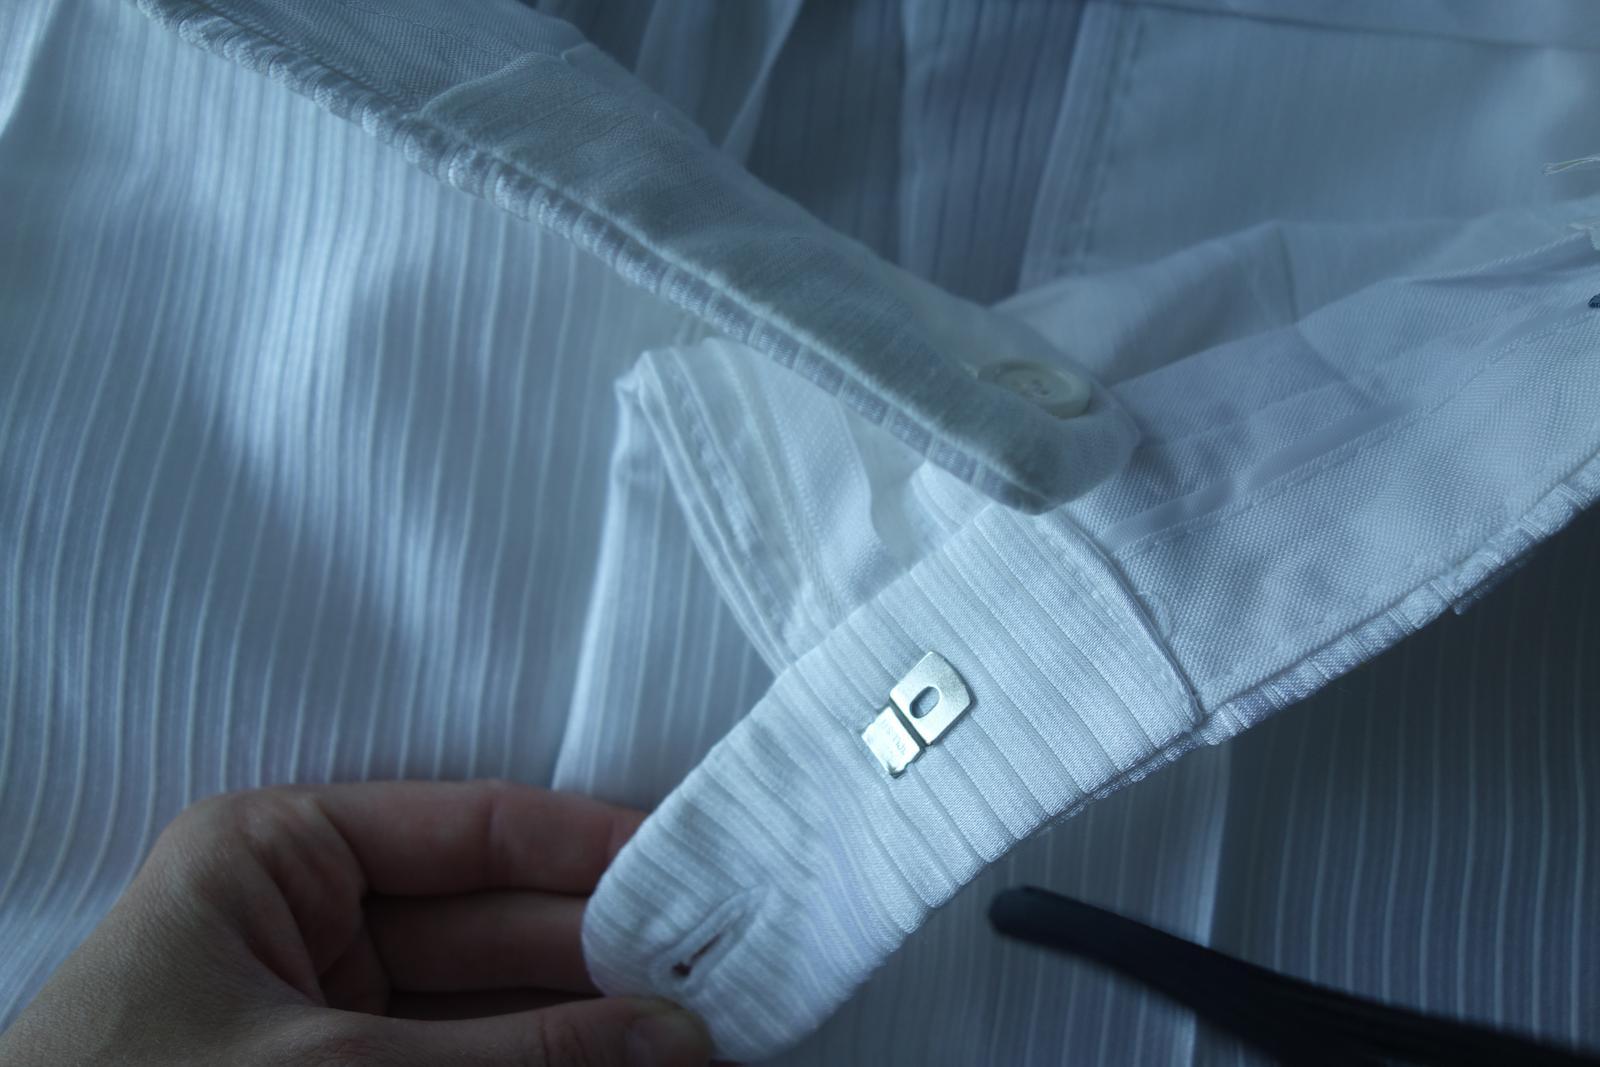 Biely oblek - Obrázok č. 3